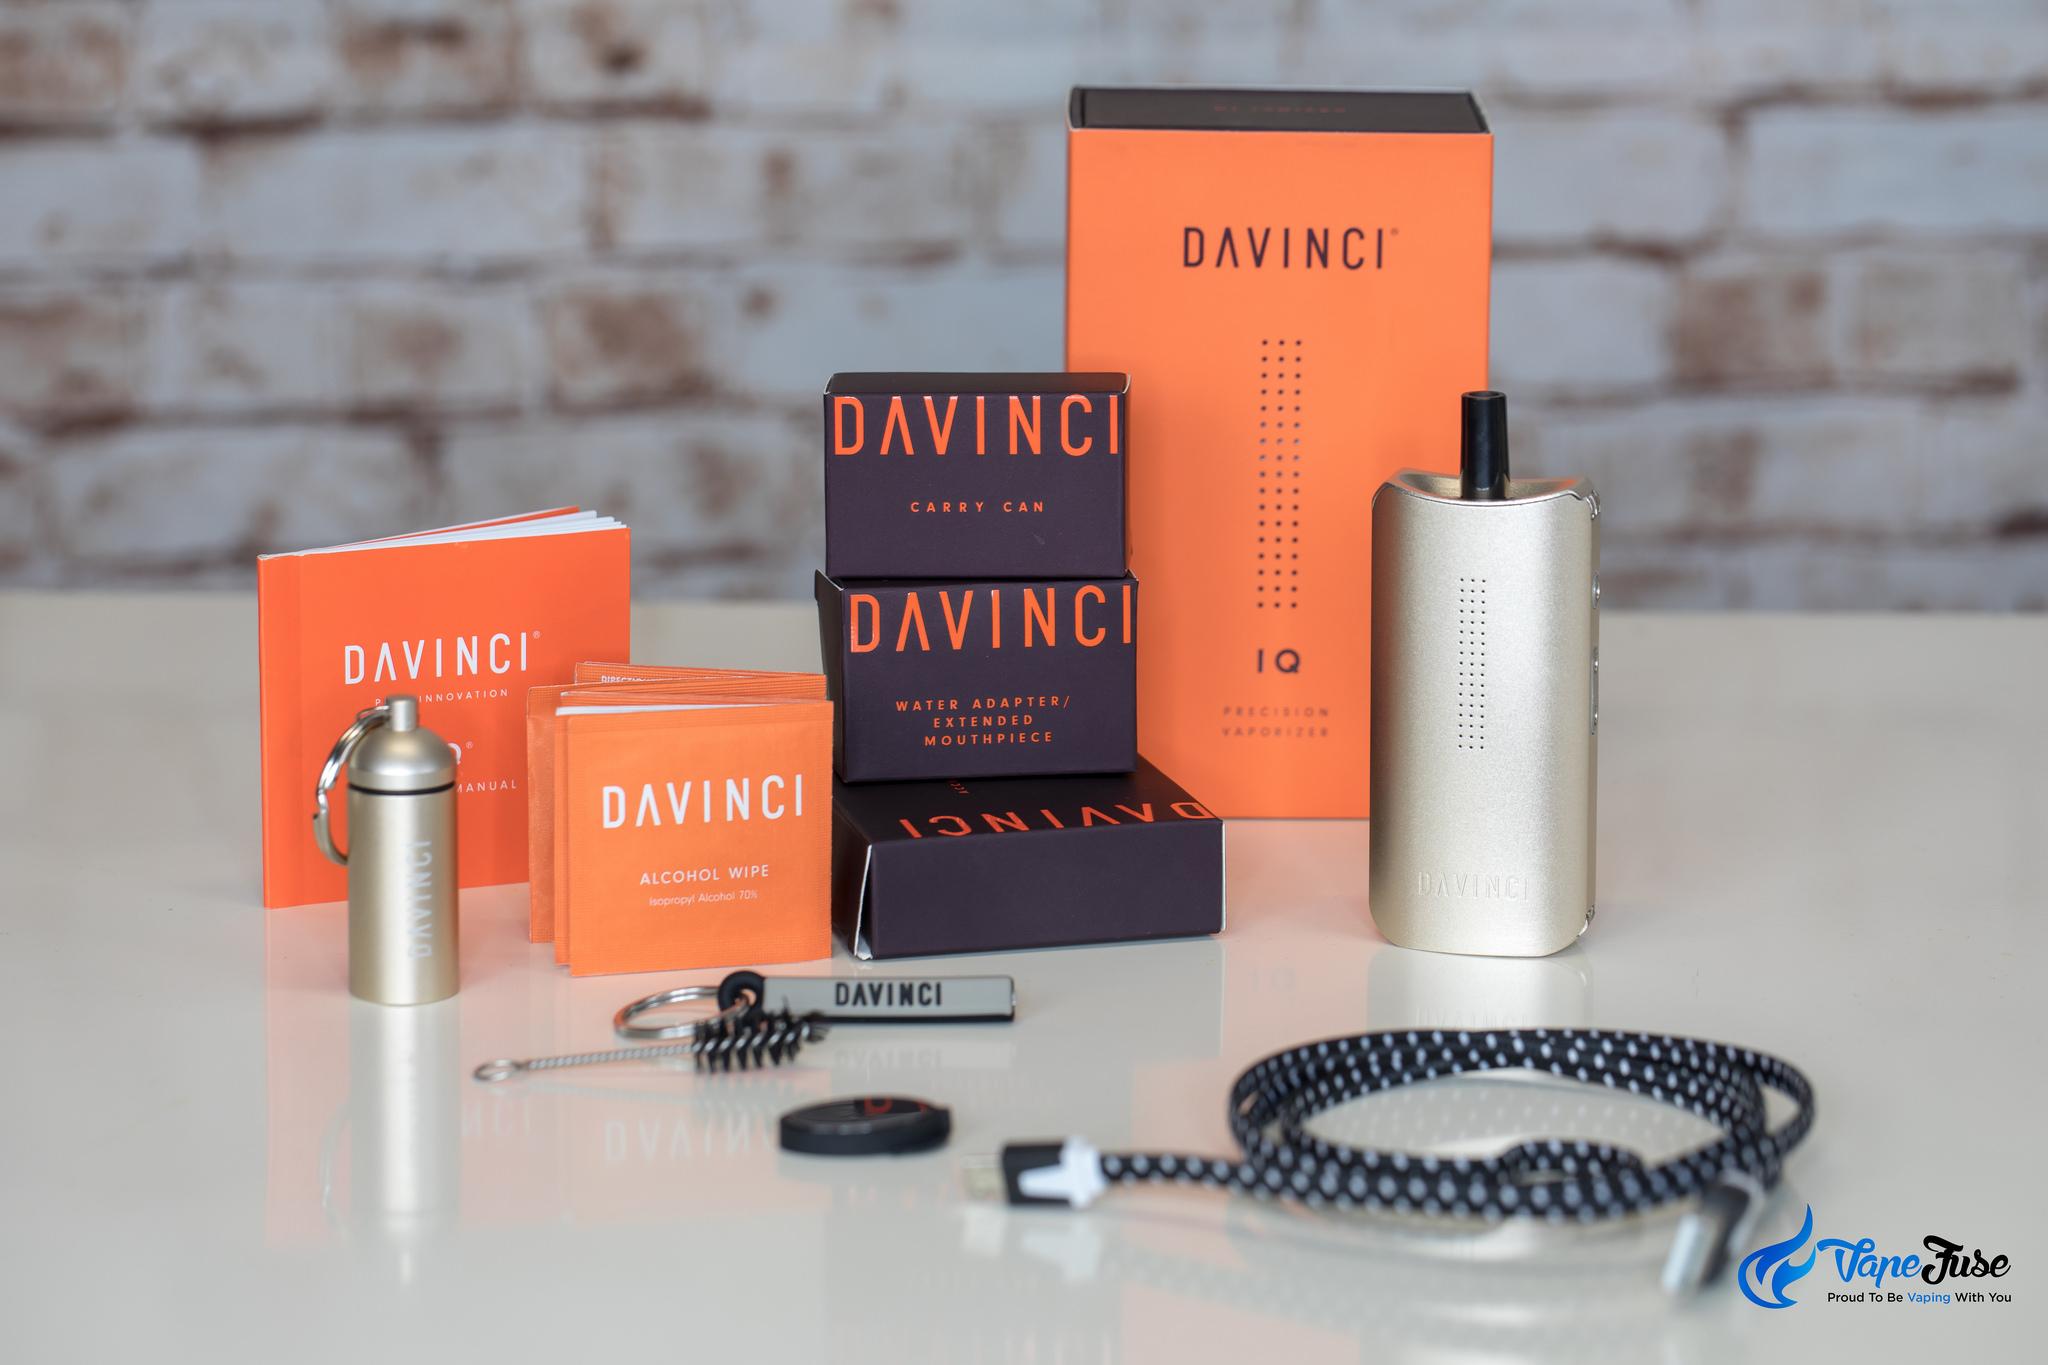 DaVinci IQ Portable Vaporizer Review